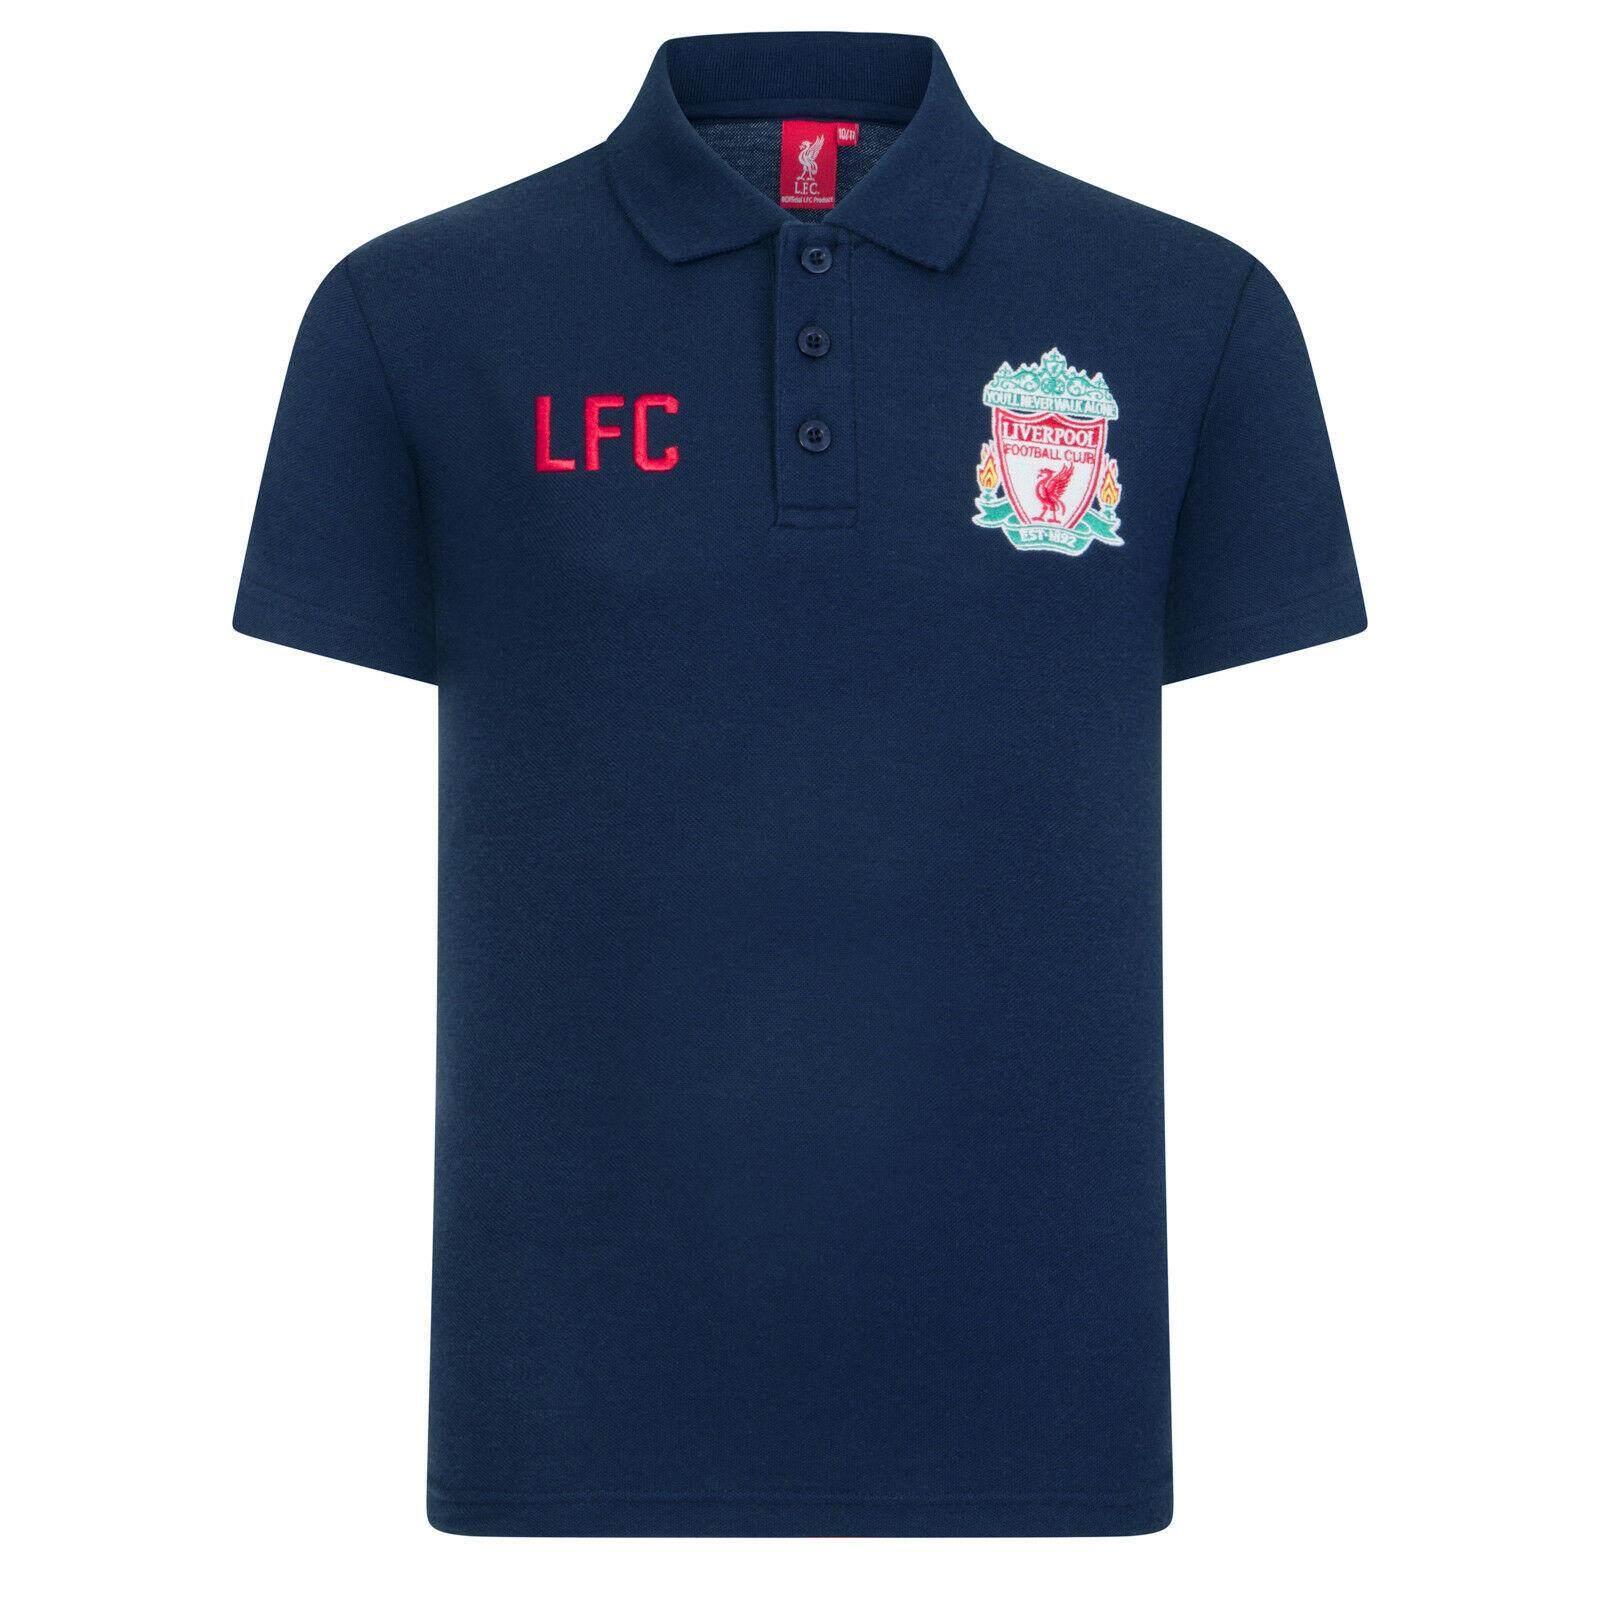 3a0416ff Liverpool Football Club Soccer Gift Crest Polo Shirt Gildan Birthday Present